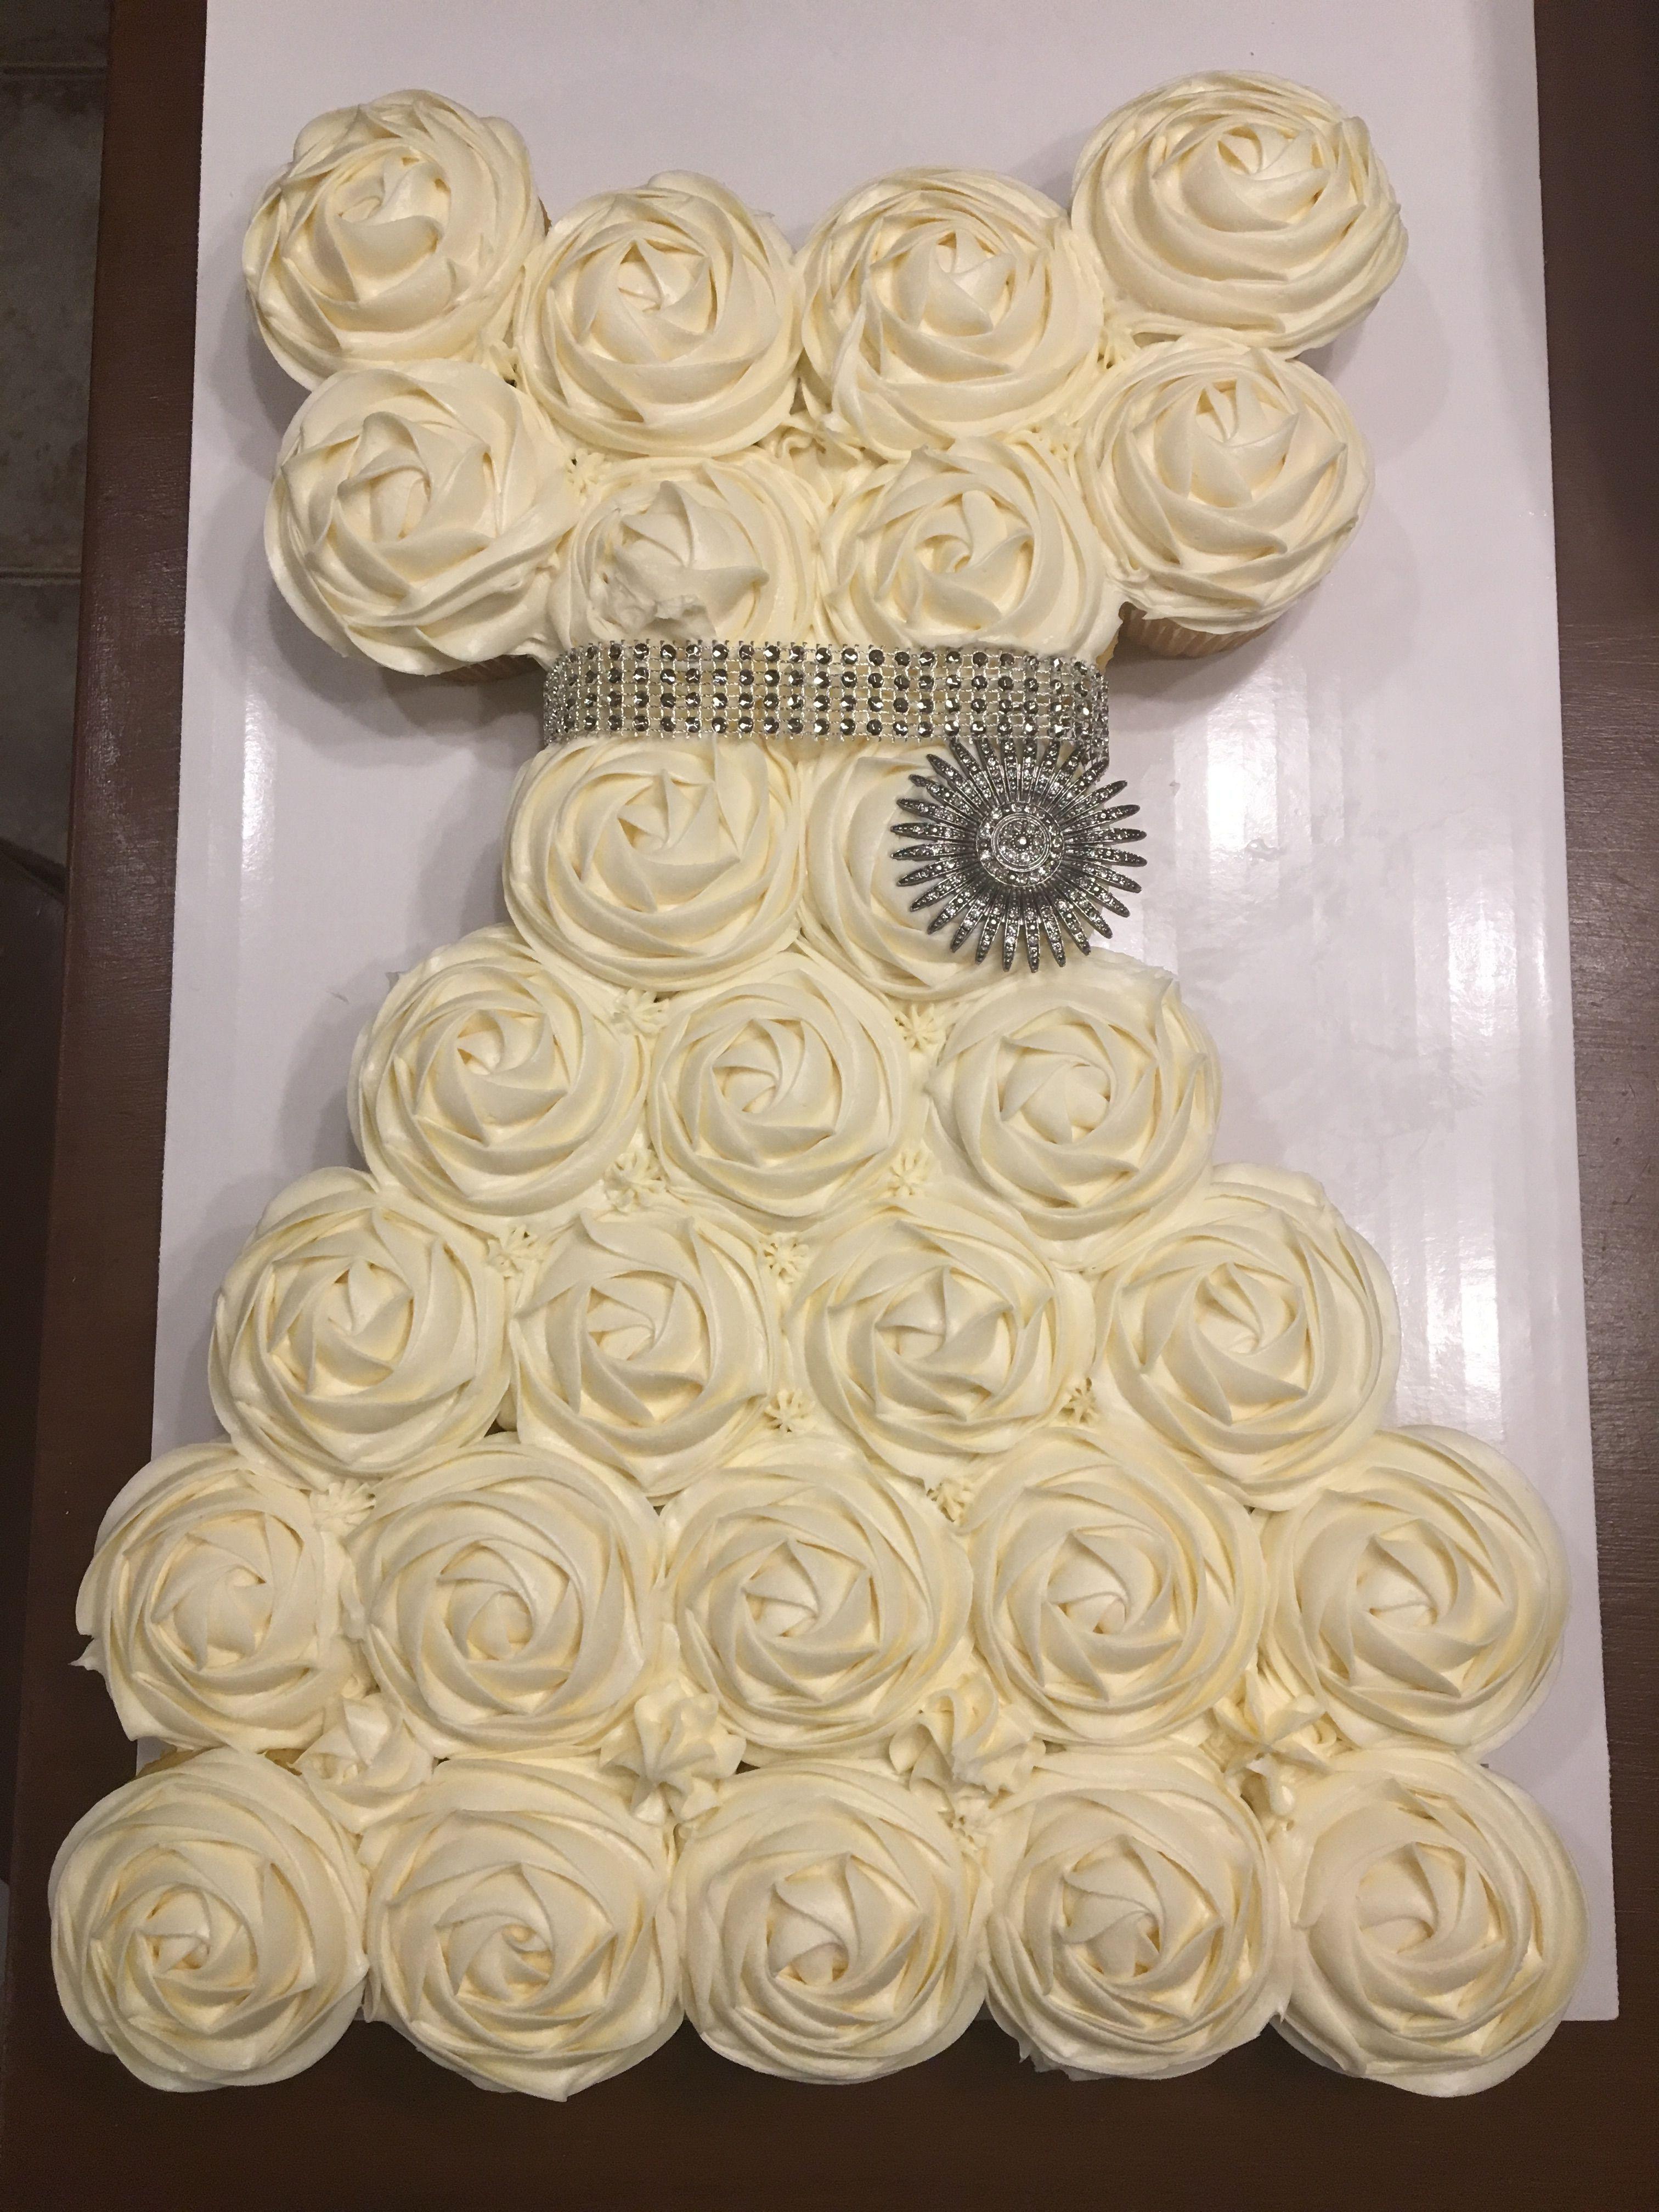 Bridal Dress Cupcake Cake   Cook\'s Creations   Pinterest   Dress ...